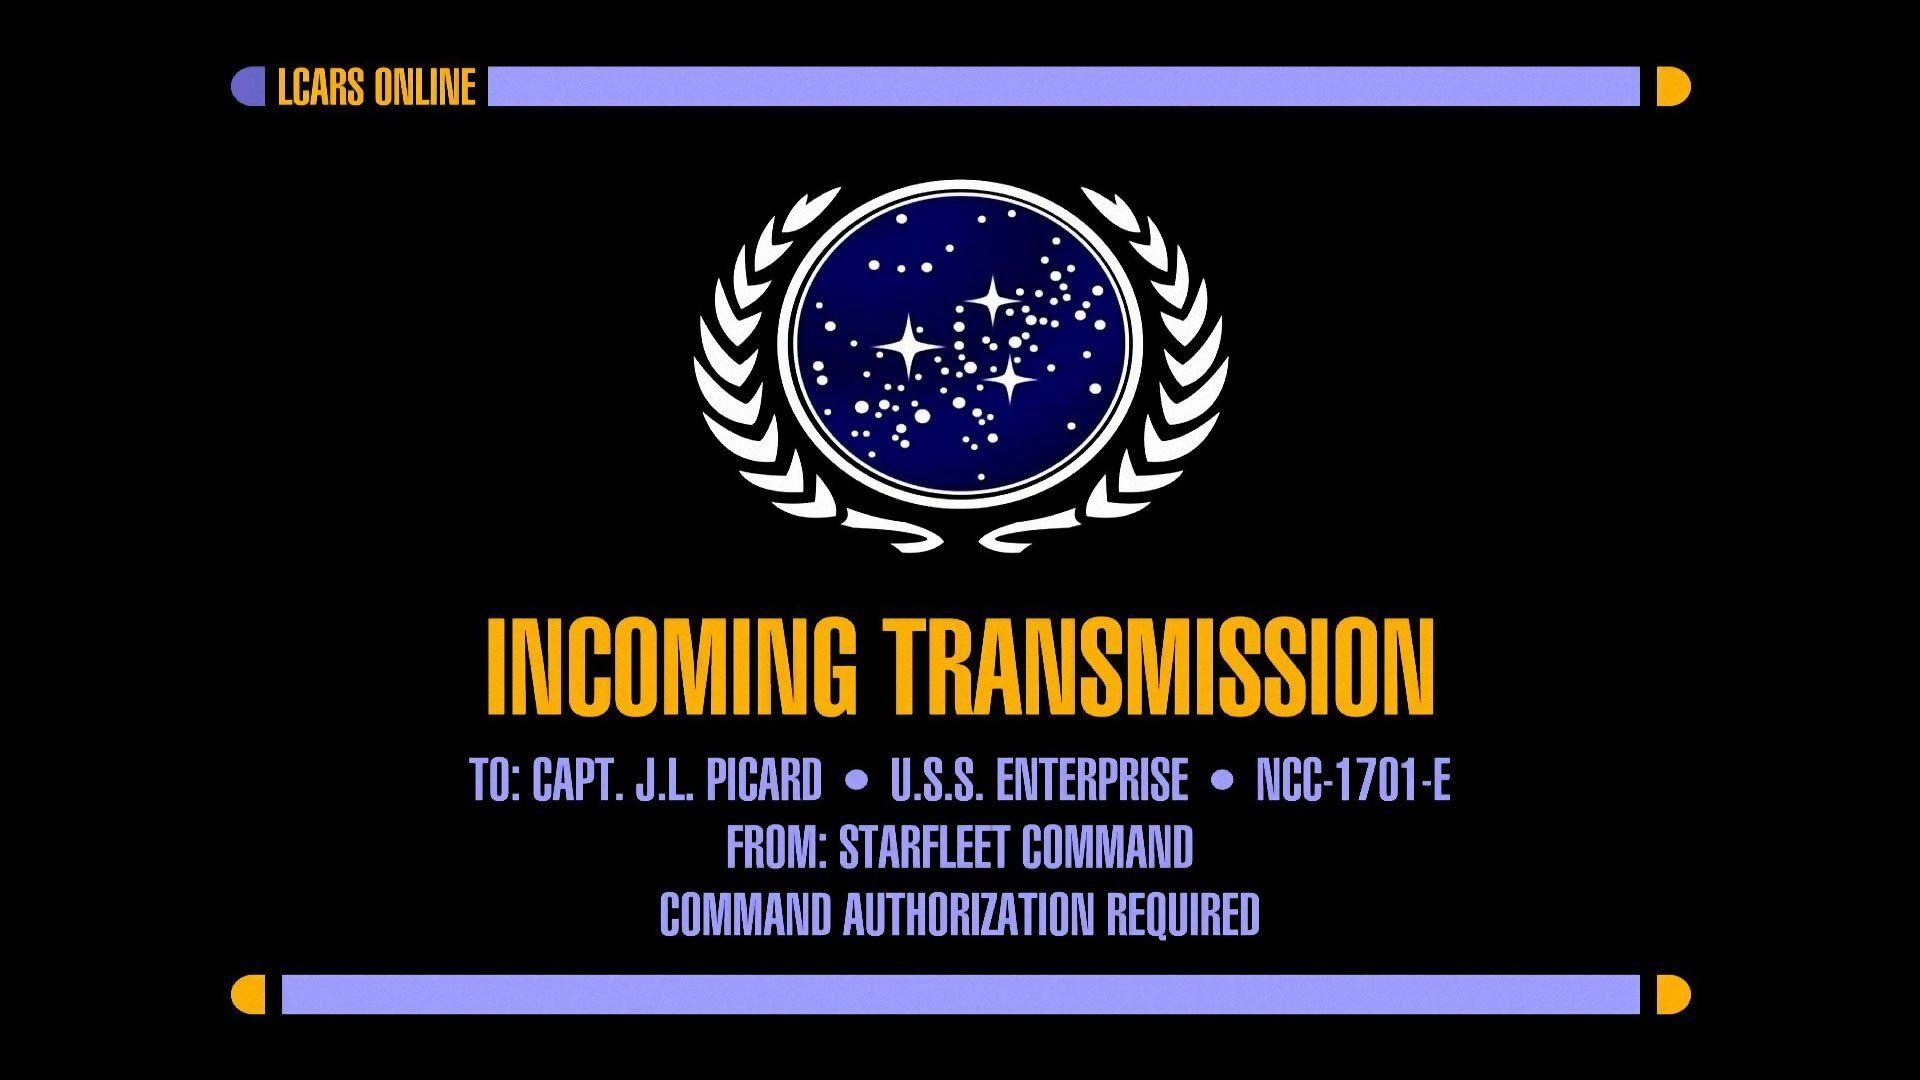 1920x1080 Star Trek Wallpaper Background Image. View